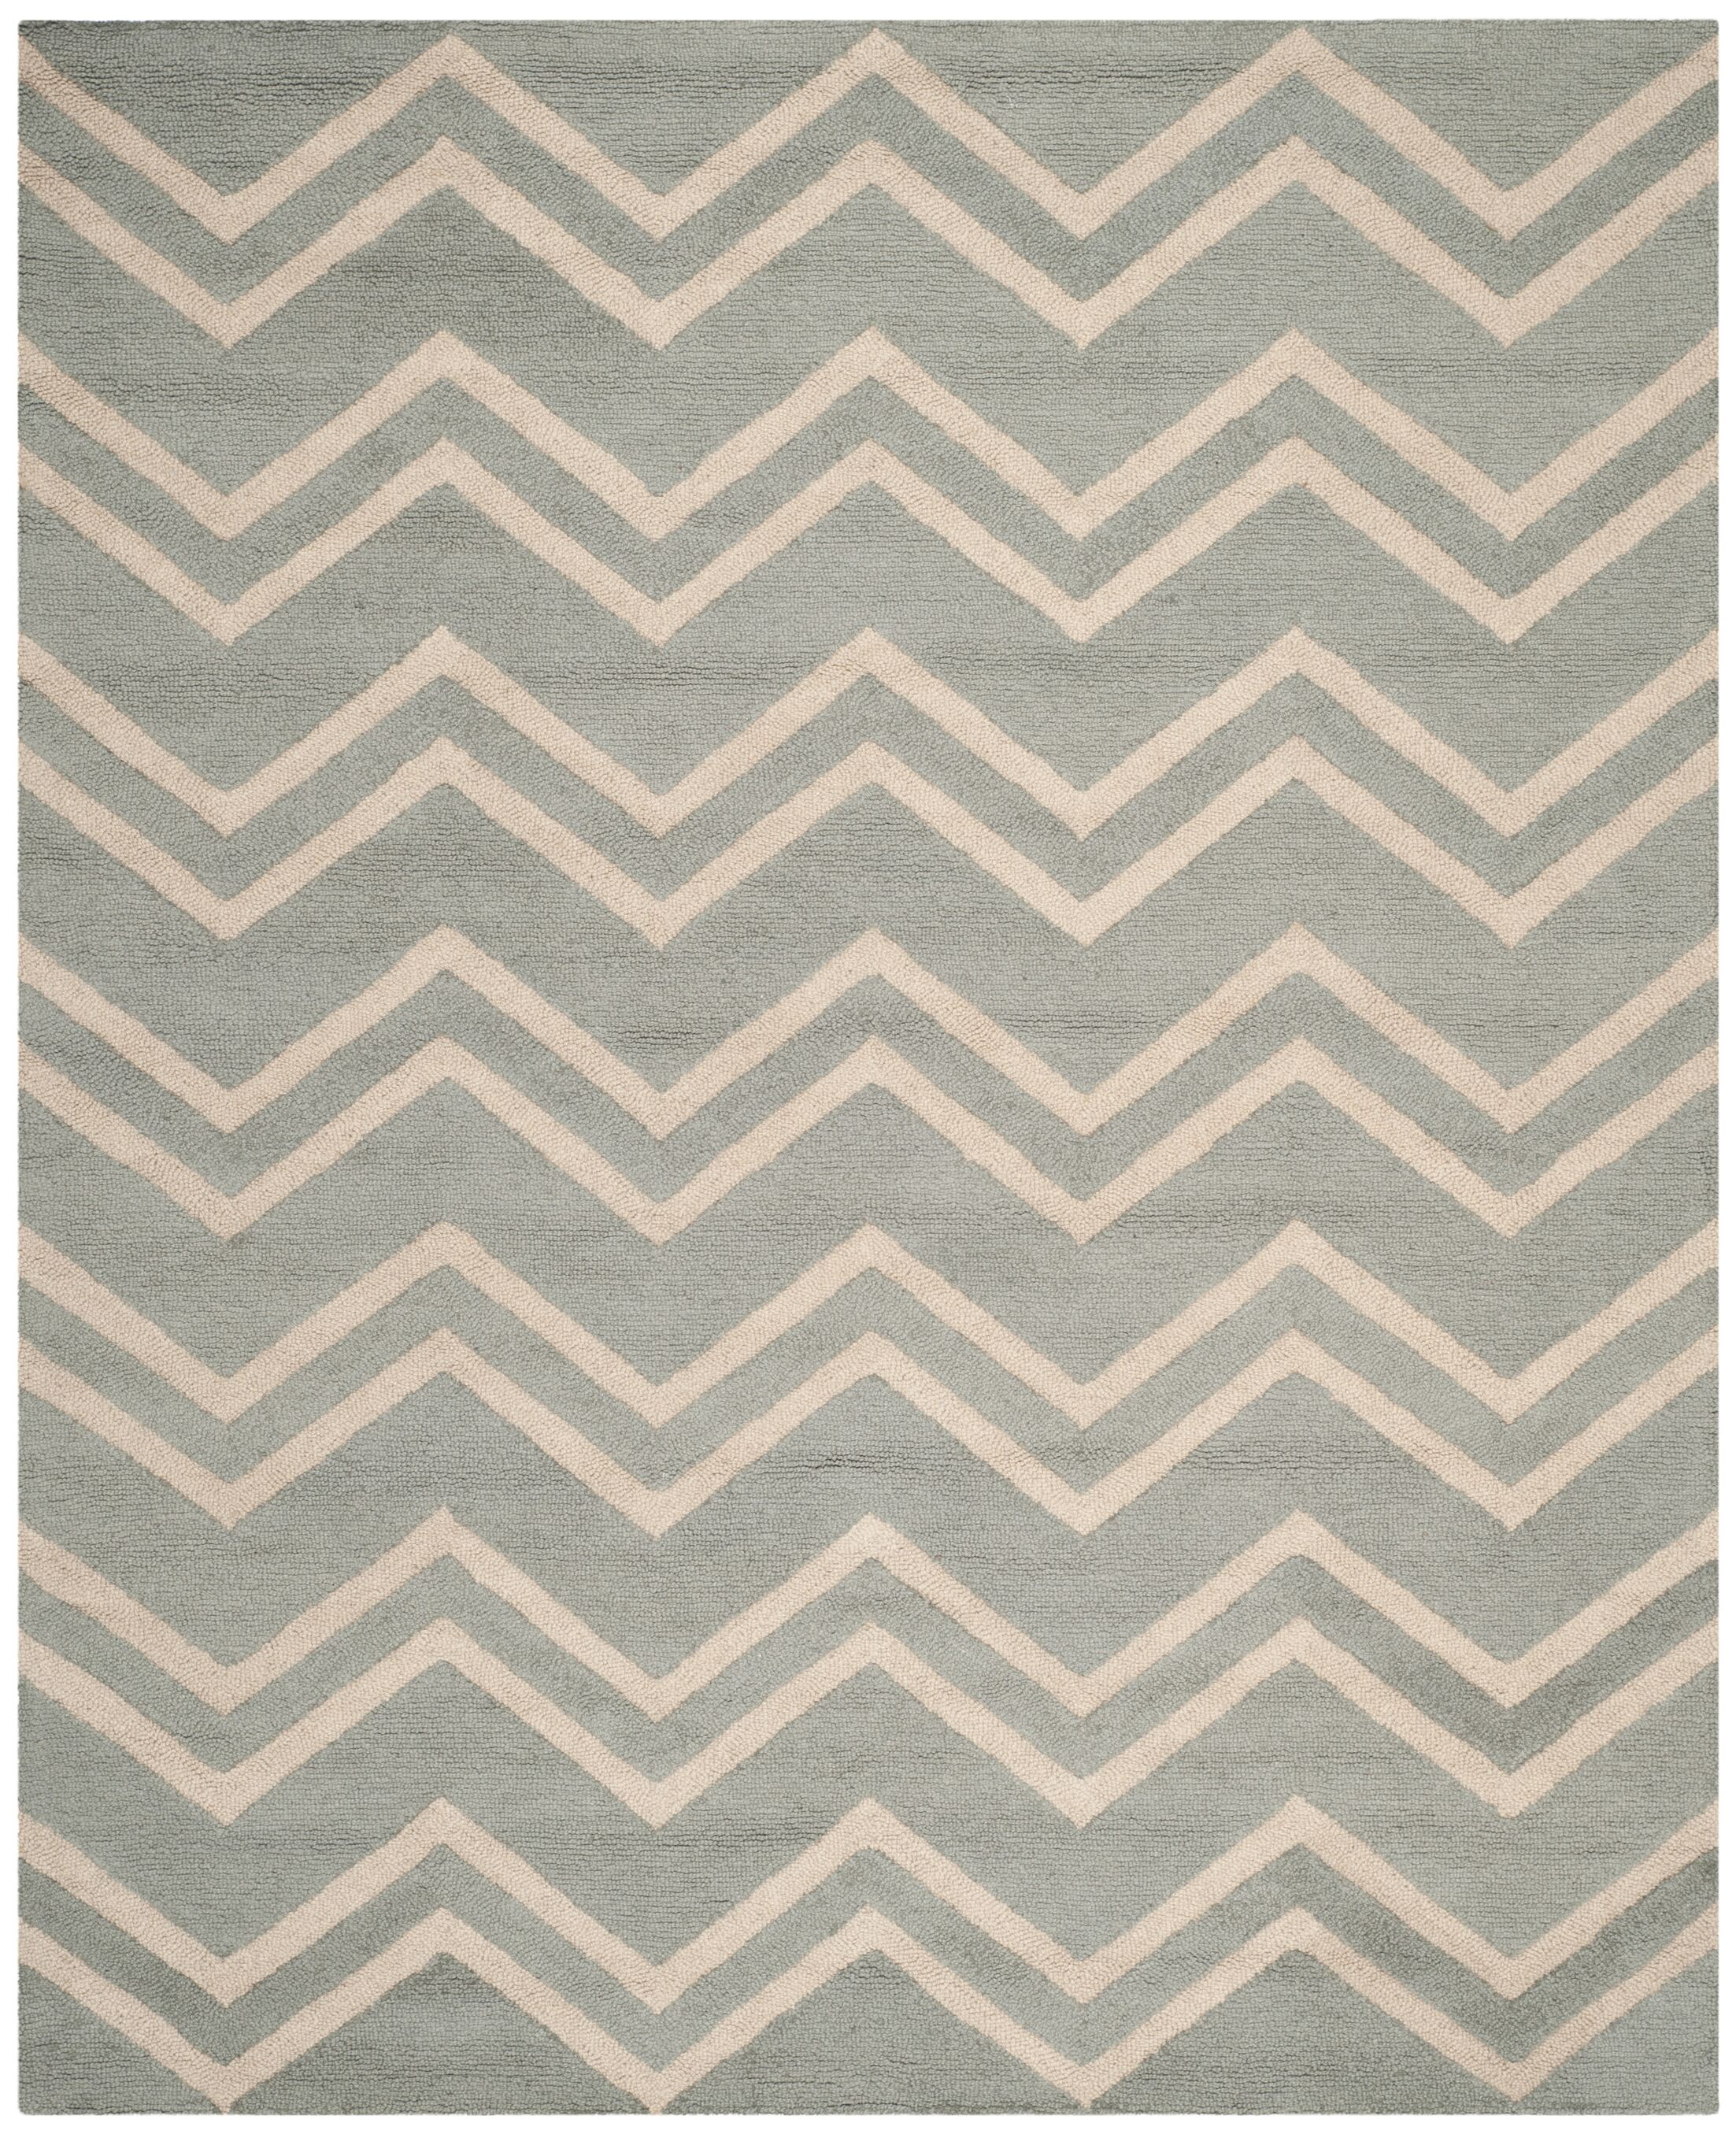 Charlenne Gray & Beige Area Rug Rug Size: Rectangle 3' x 5'